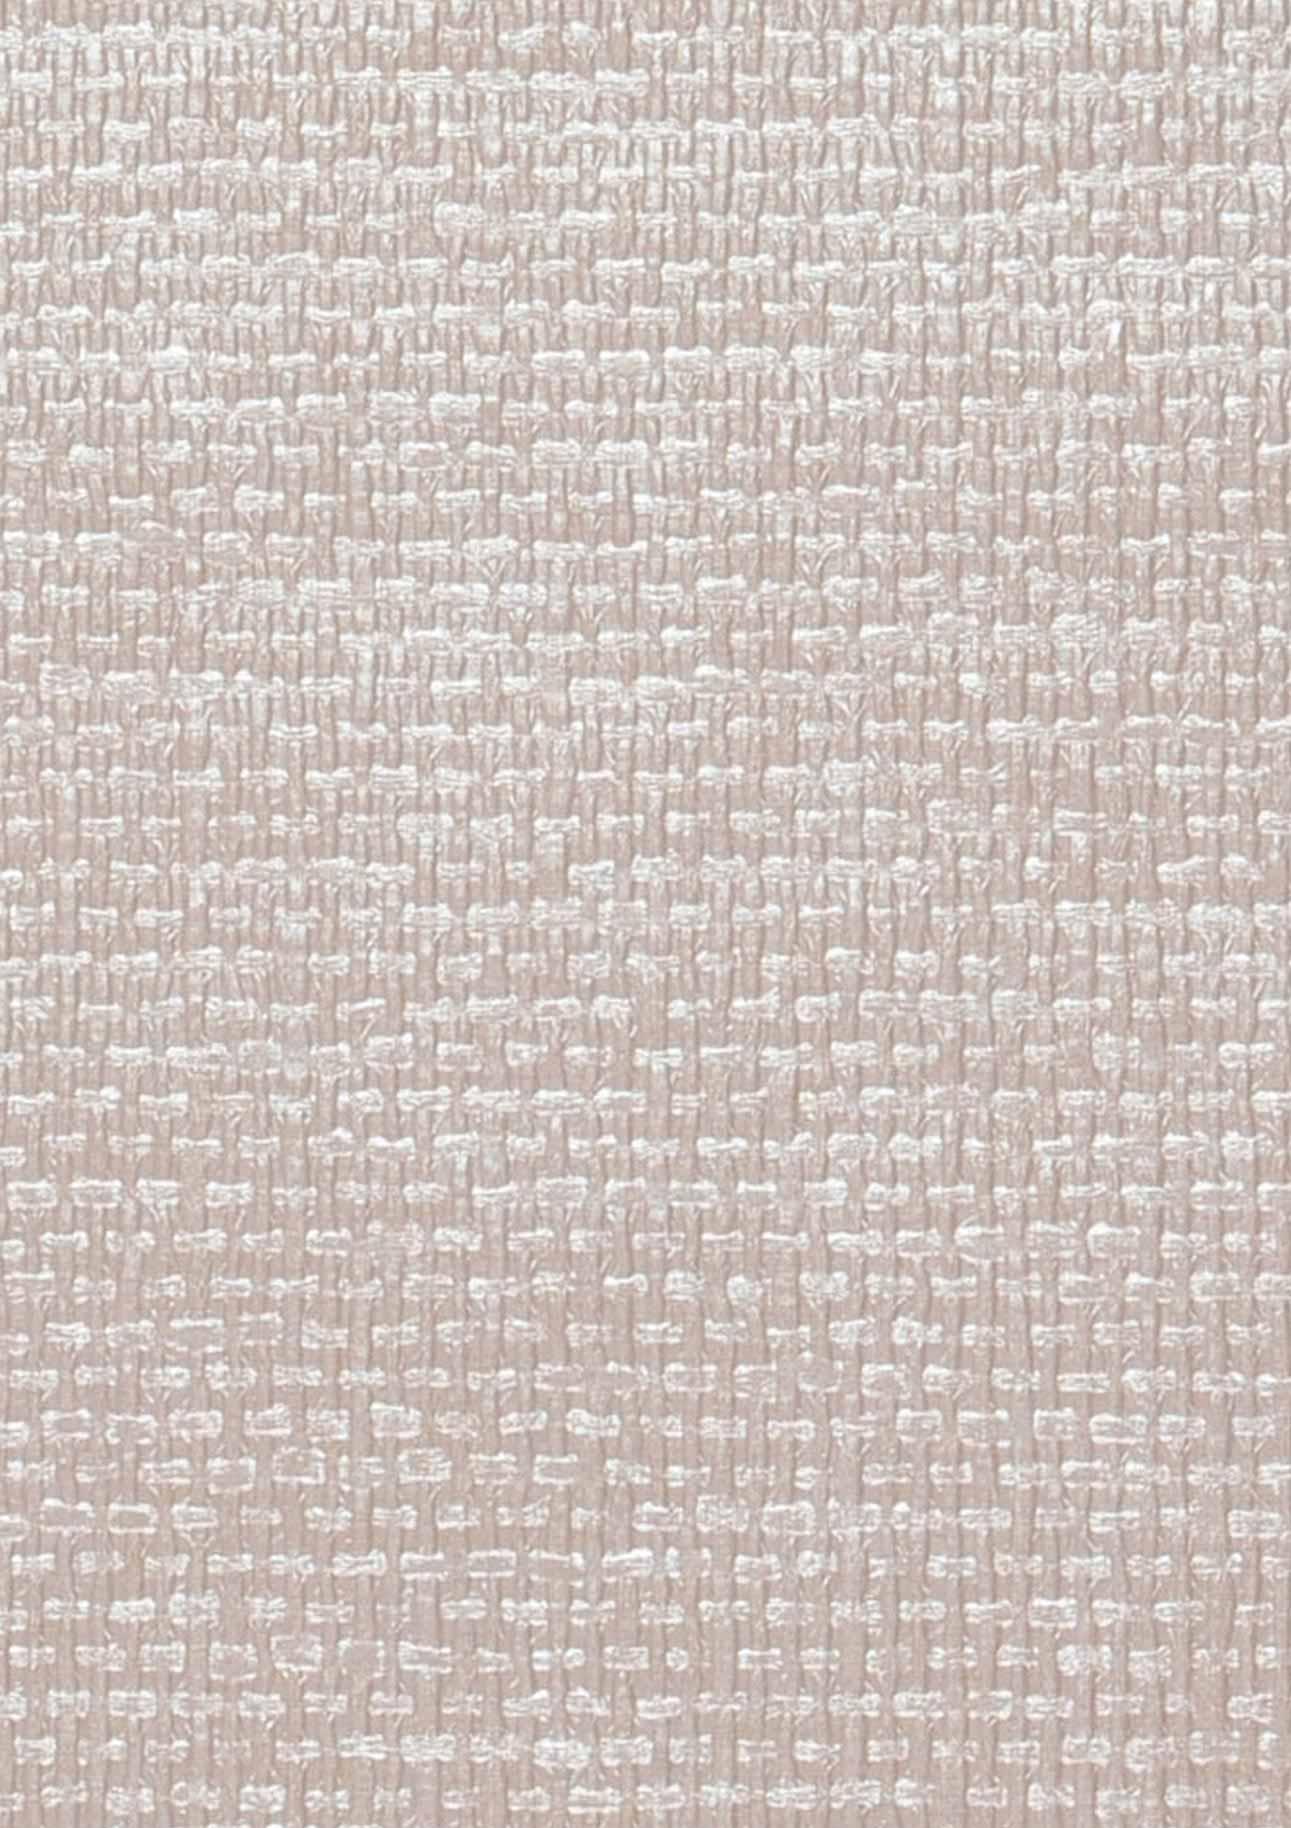 Papel pintado kronos aluminio blanco papeles de los 70 - Papel pintado anos 70 ...